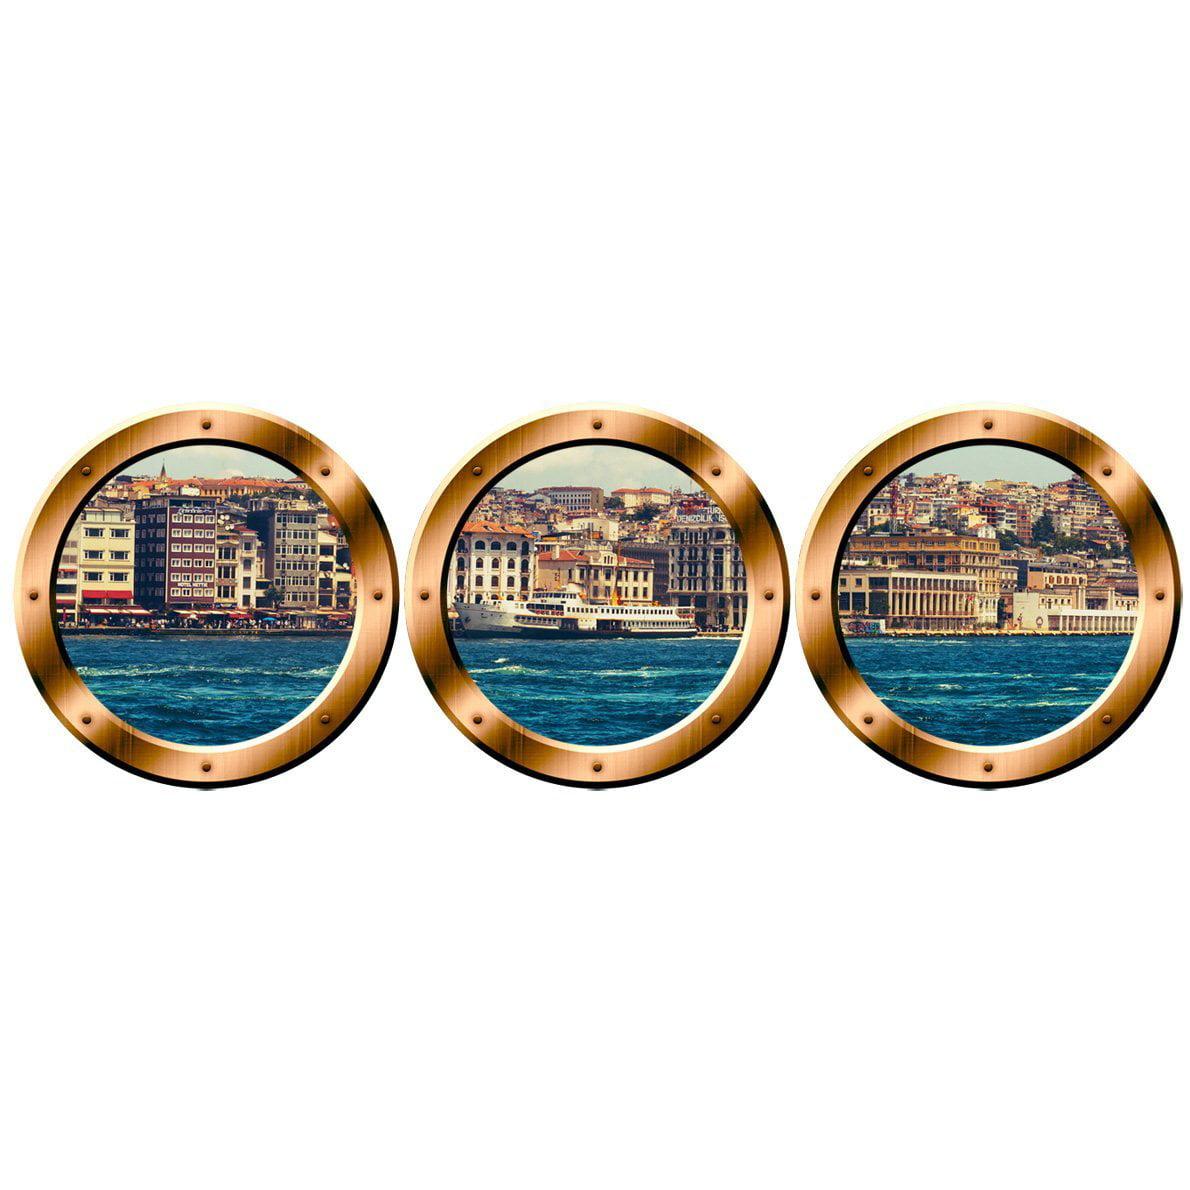 "VWAQ City Skyline Wall Murals, Porthole Cityscape Stickers - Peel & Stick Decals - VWAQ-SPW5 (24"" Diameter, Bronze)"